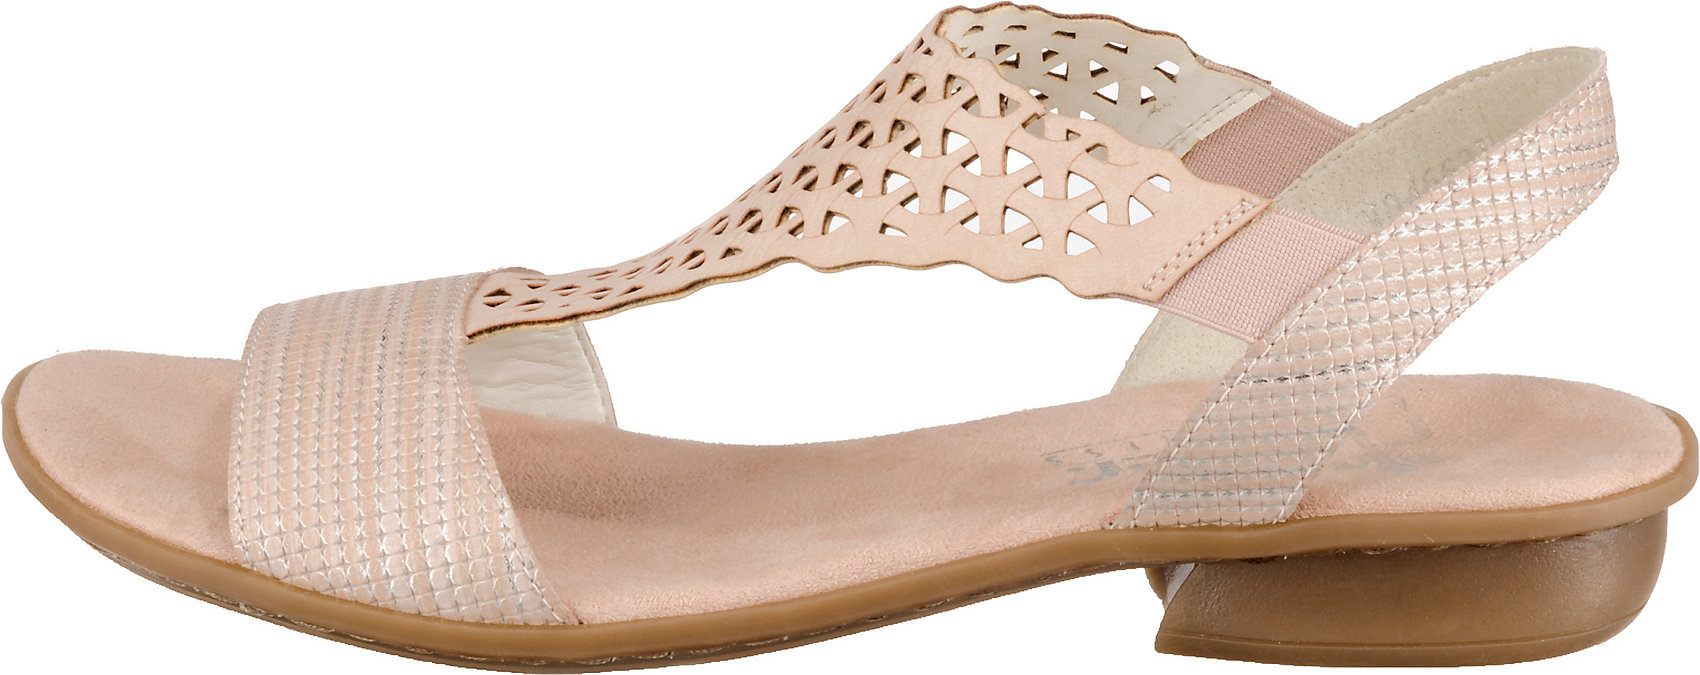 Neu rieker Klassische Sandalen 10626294 für Damen rosa